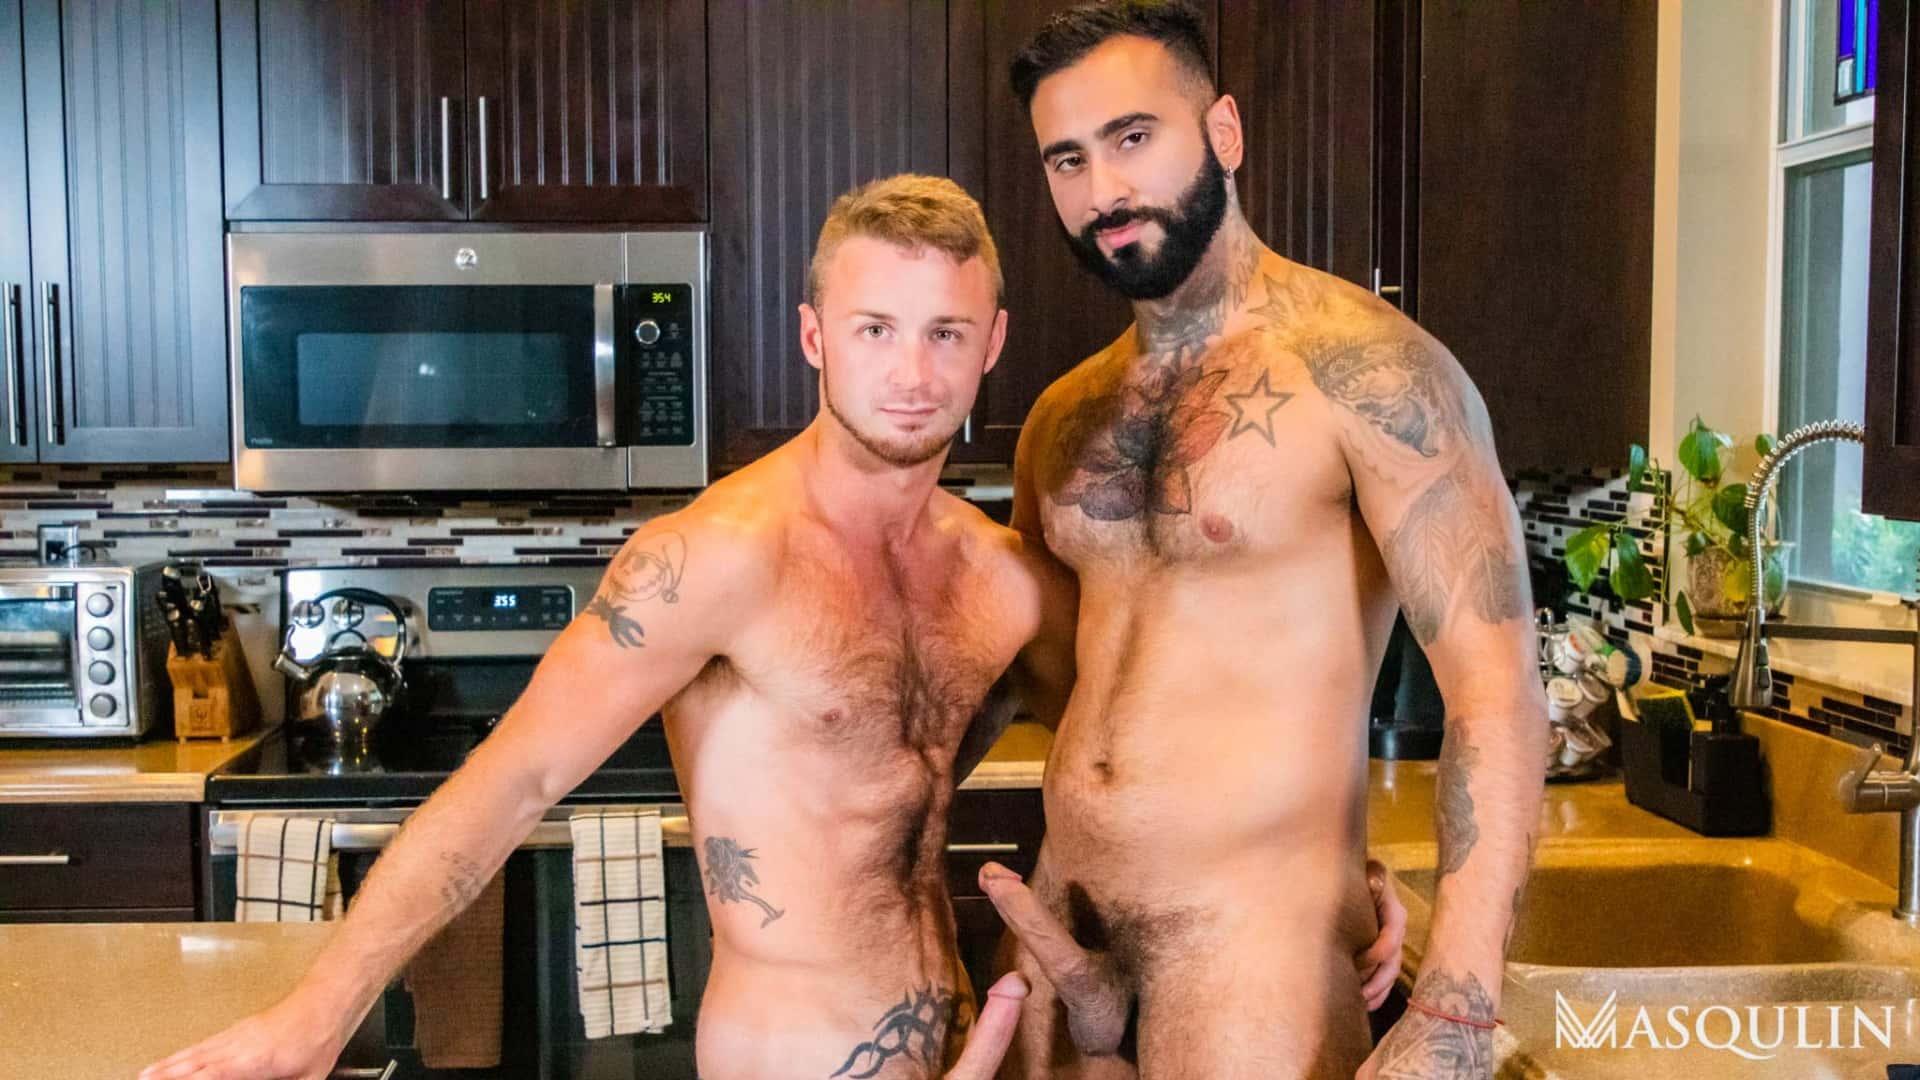 Boys Trip, Part 1 – Chad Taylor & Rikk York